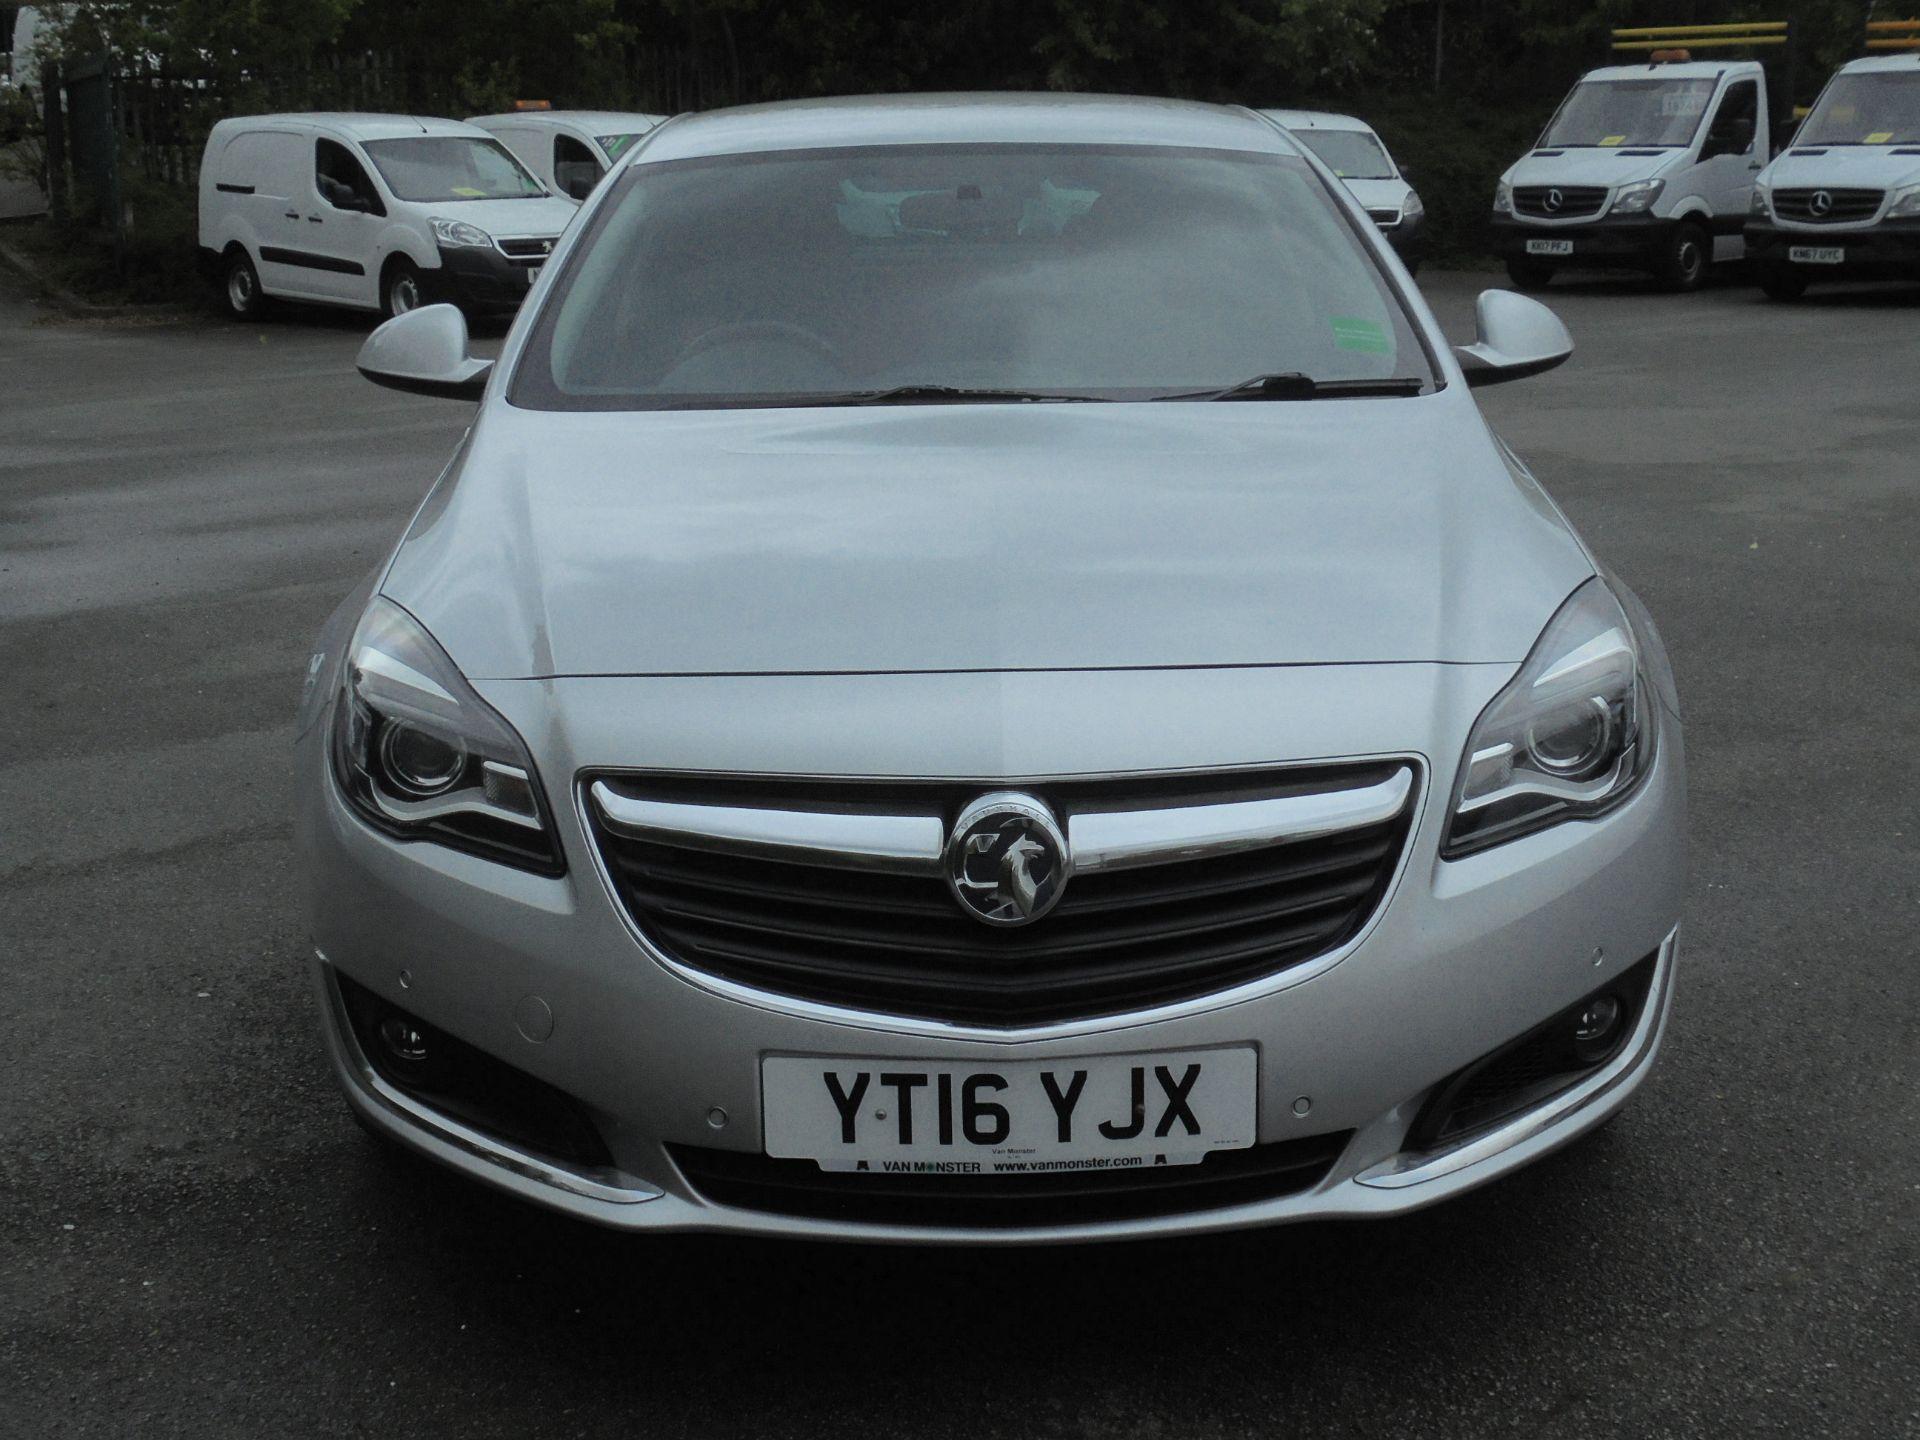 2016 Vauxhall Insignia 1.6 Cdti Sri Nav 5Dr [Start Stop] (YT16YJX) Image 2